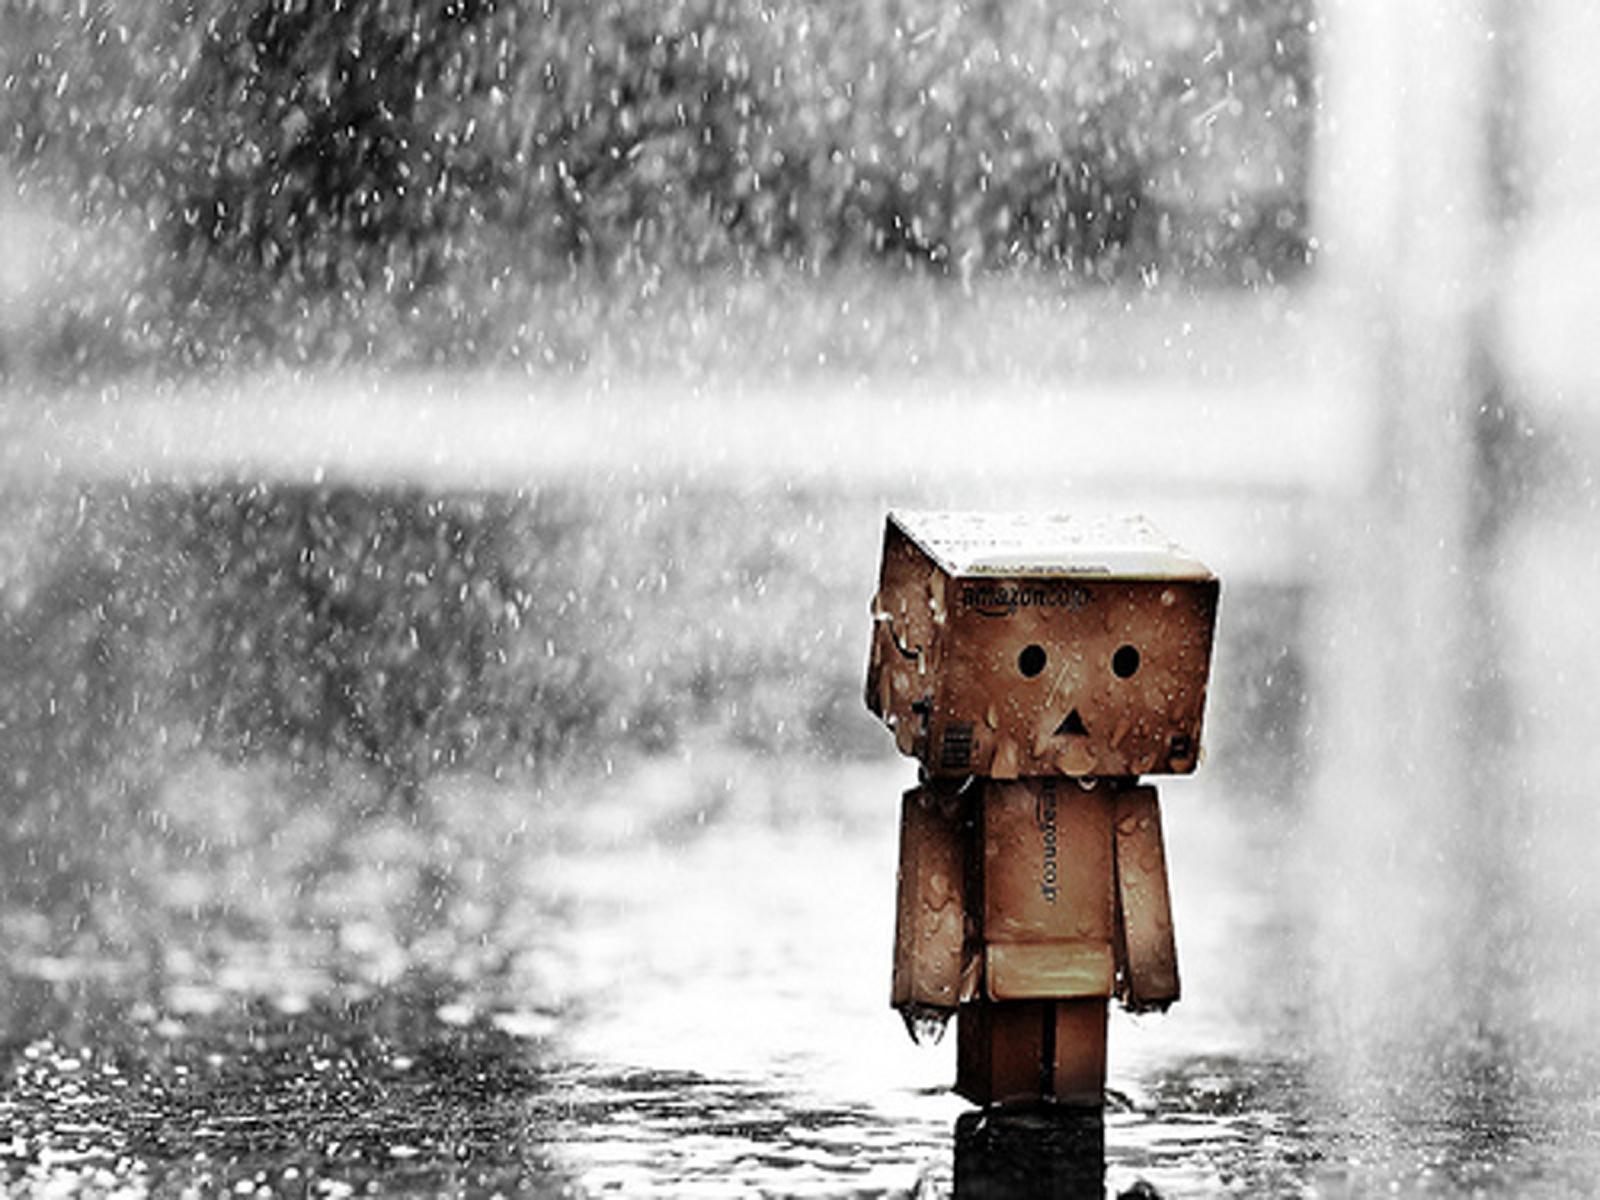 http://2.bp.blogspot.com/-5FNryesVAkg/T5UHhHxqXiI/AAAAAAAAABY/KO4NMl5N-cs/s1600/danboard_boxman_kutu_adam_rain_cry_www.Vvallpaper.net.jpg